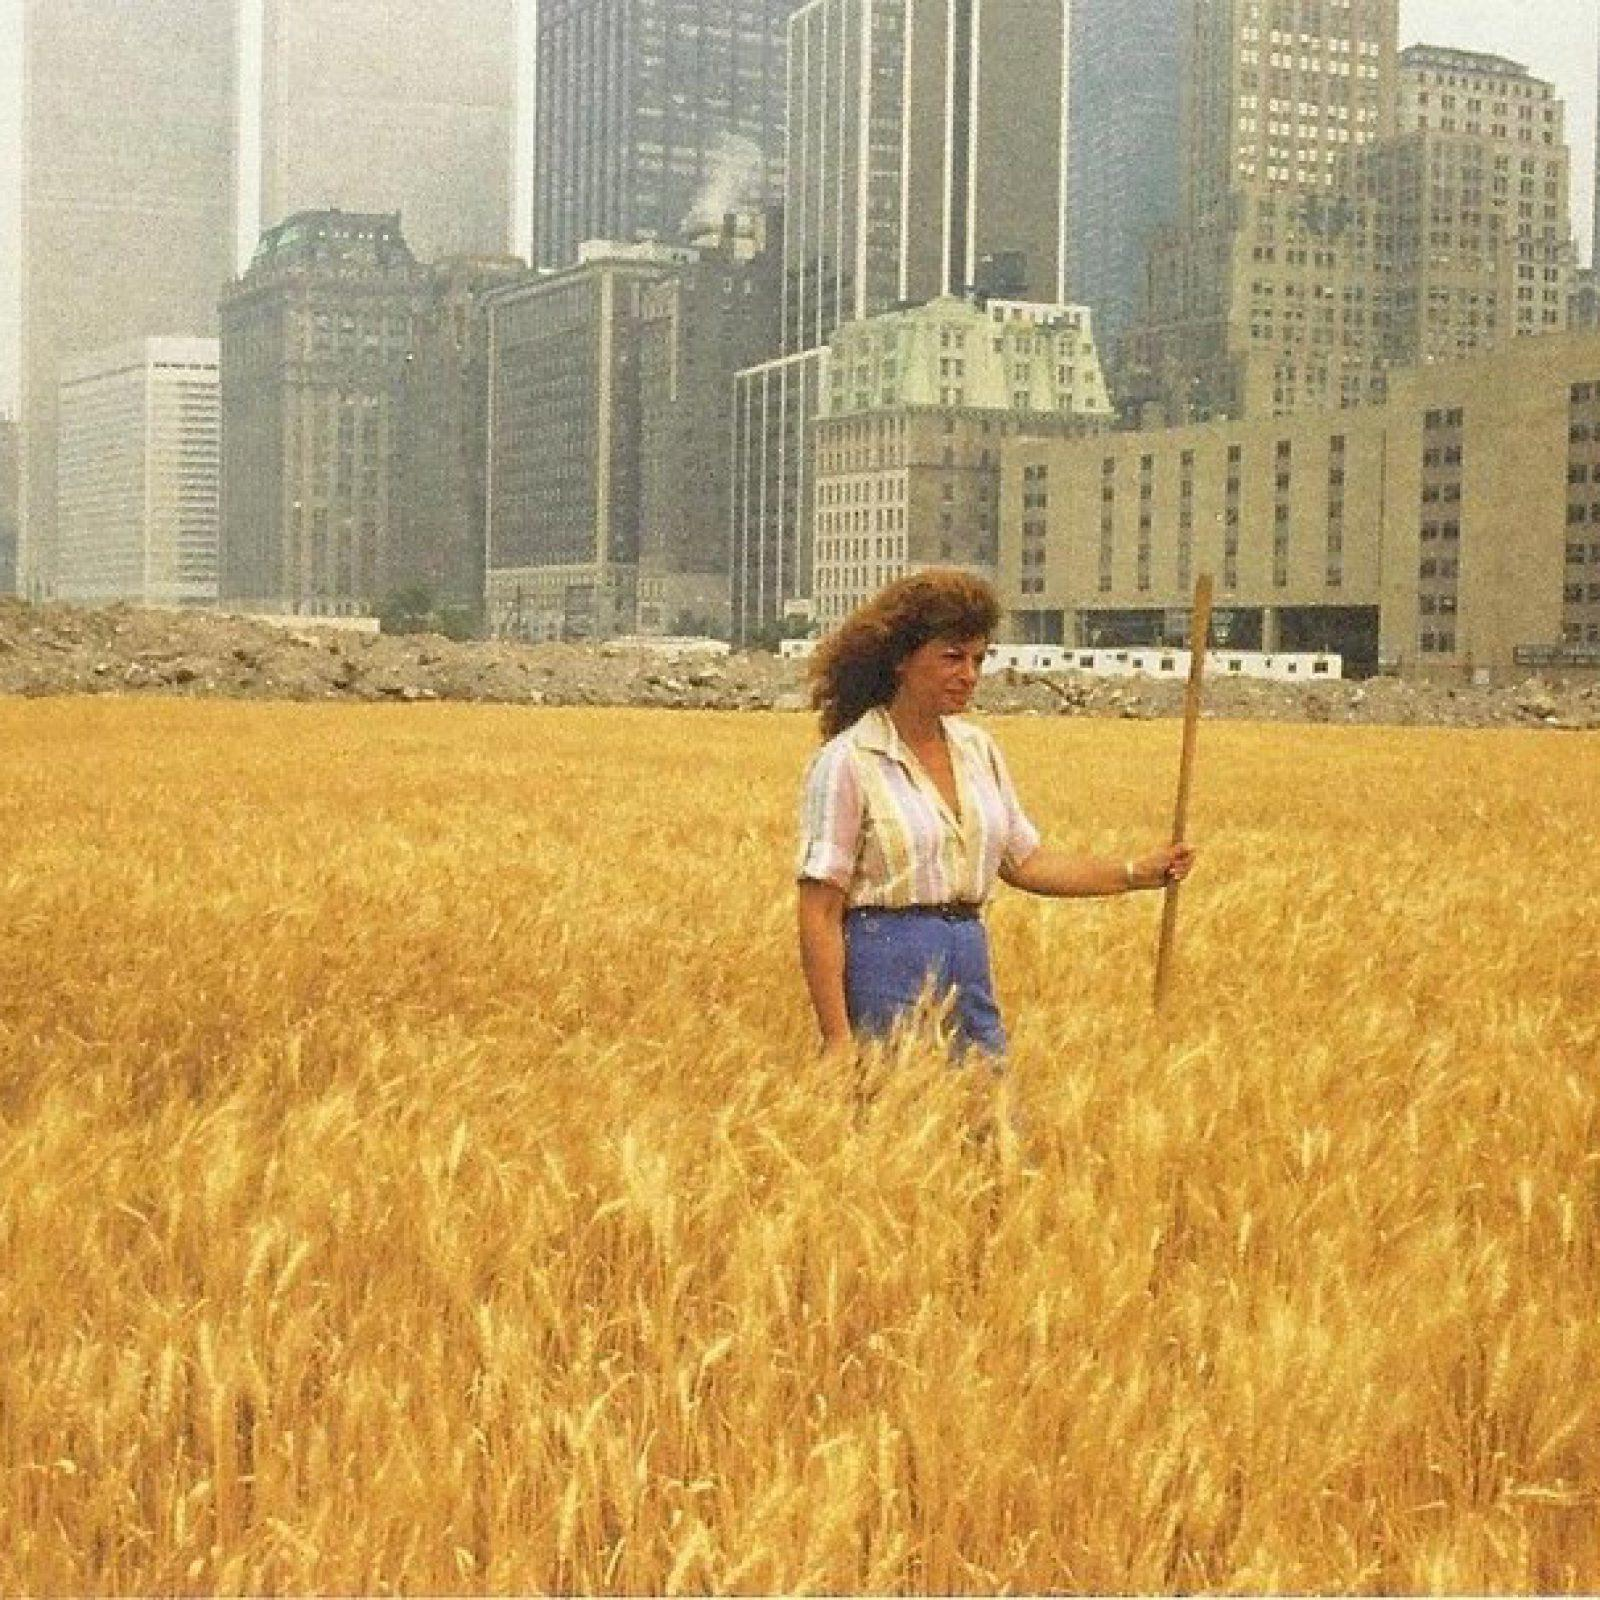 Agnes Denes, Wheatfield – A Confrontation Battery Park Landfill, Downtown Manhattan, Summer, 1982, collection particulière